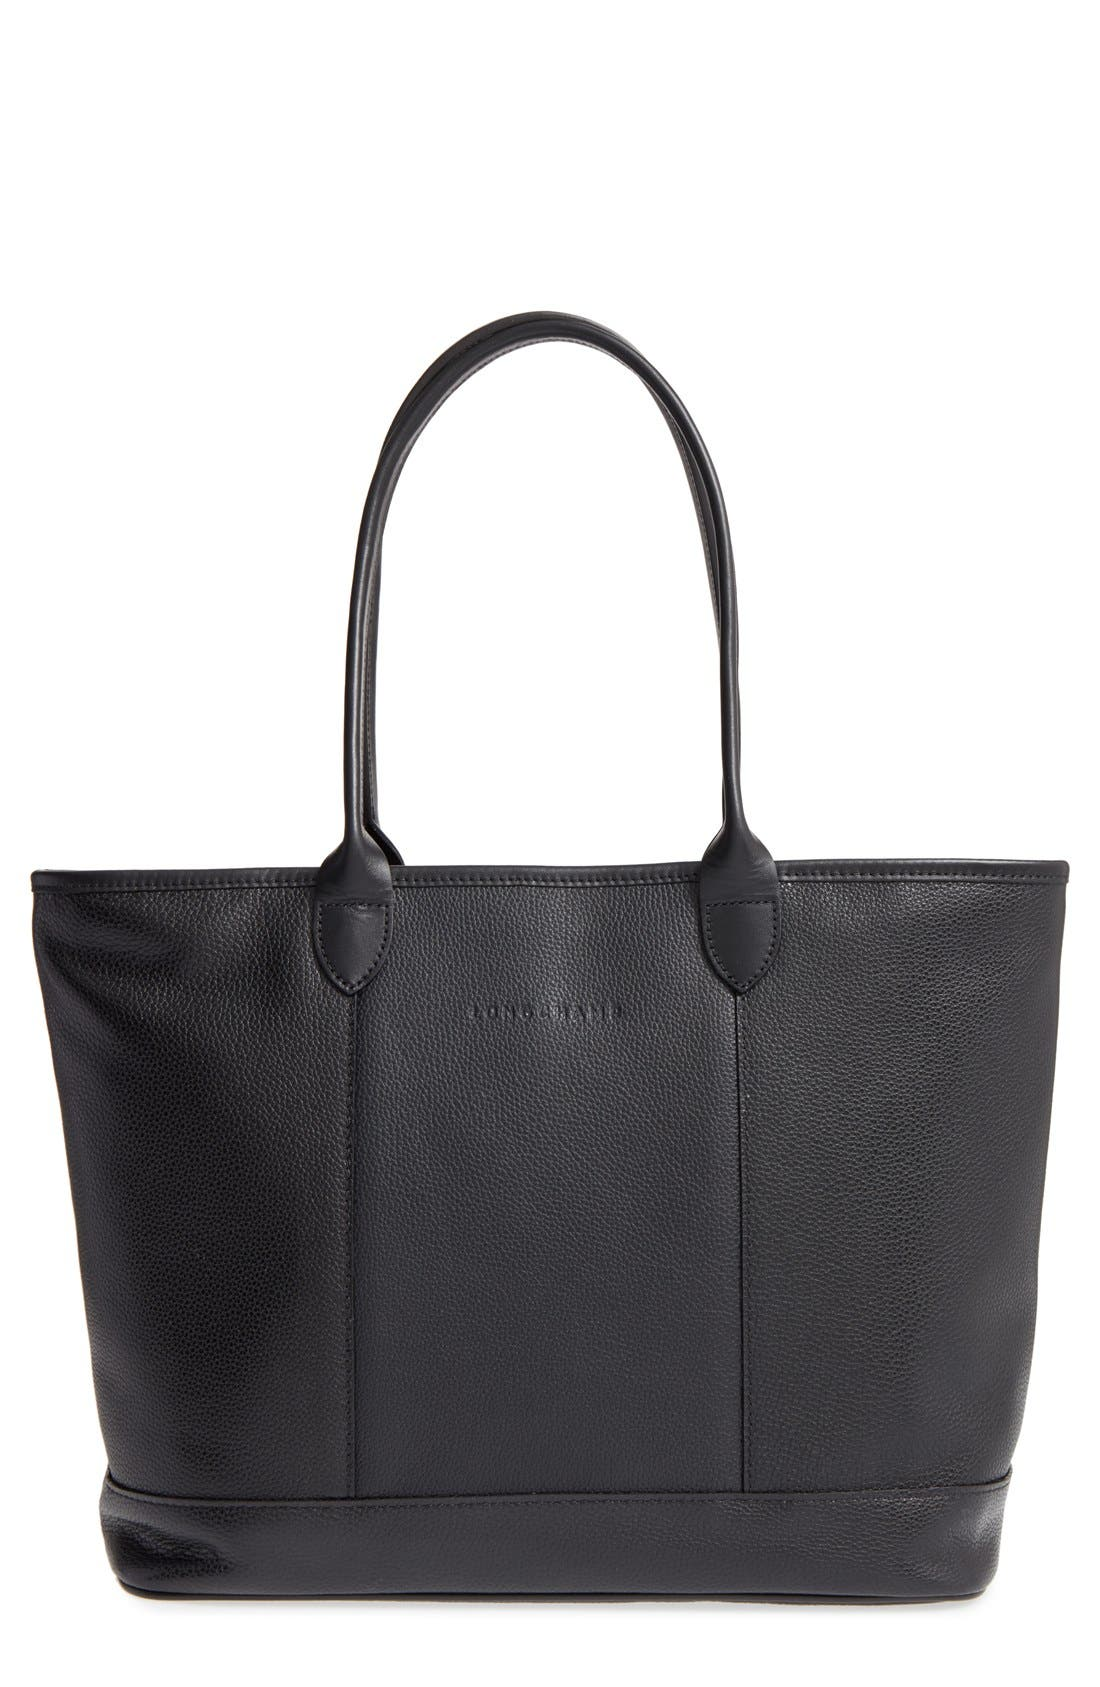 Main Image - Longchamp 'Veau' Leather Tote